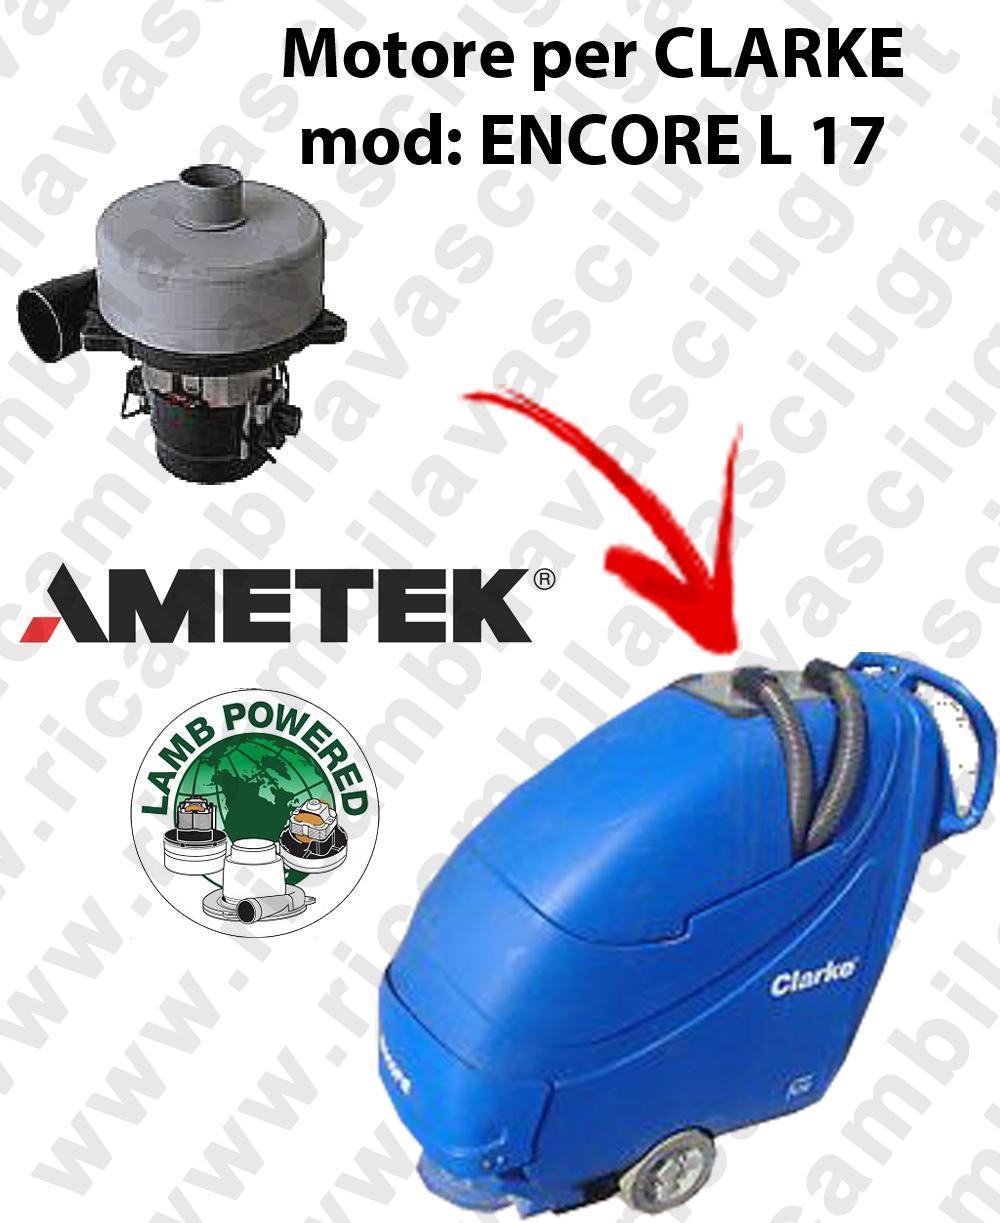 ENCORE L 17 Motore de aspiración LAMB AMETEK para fregadora CLARKE